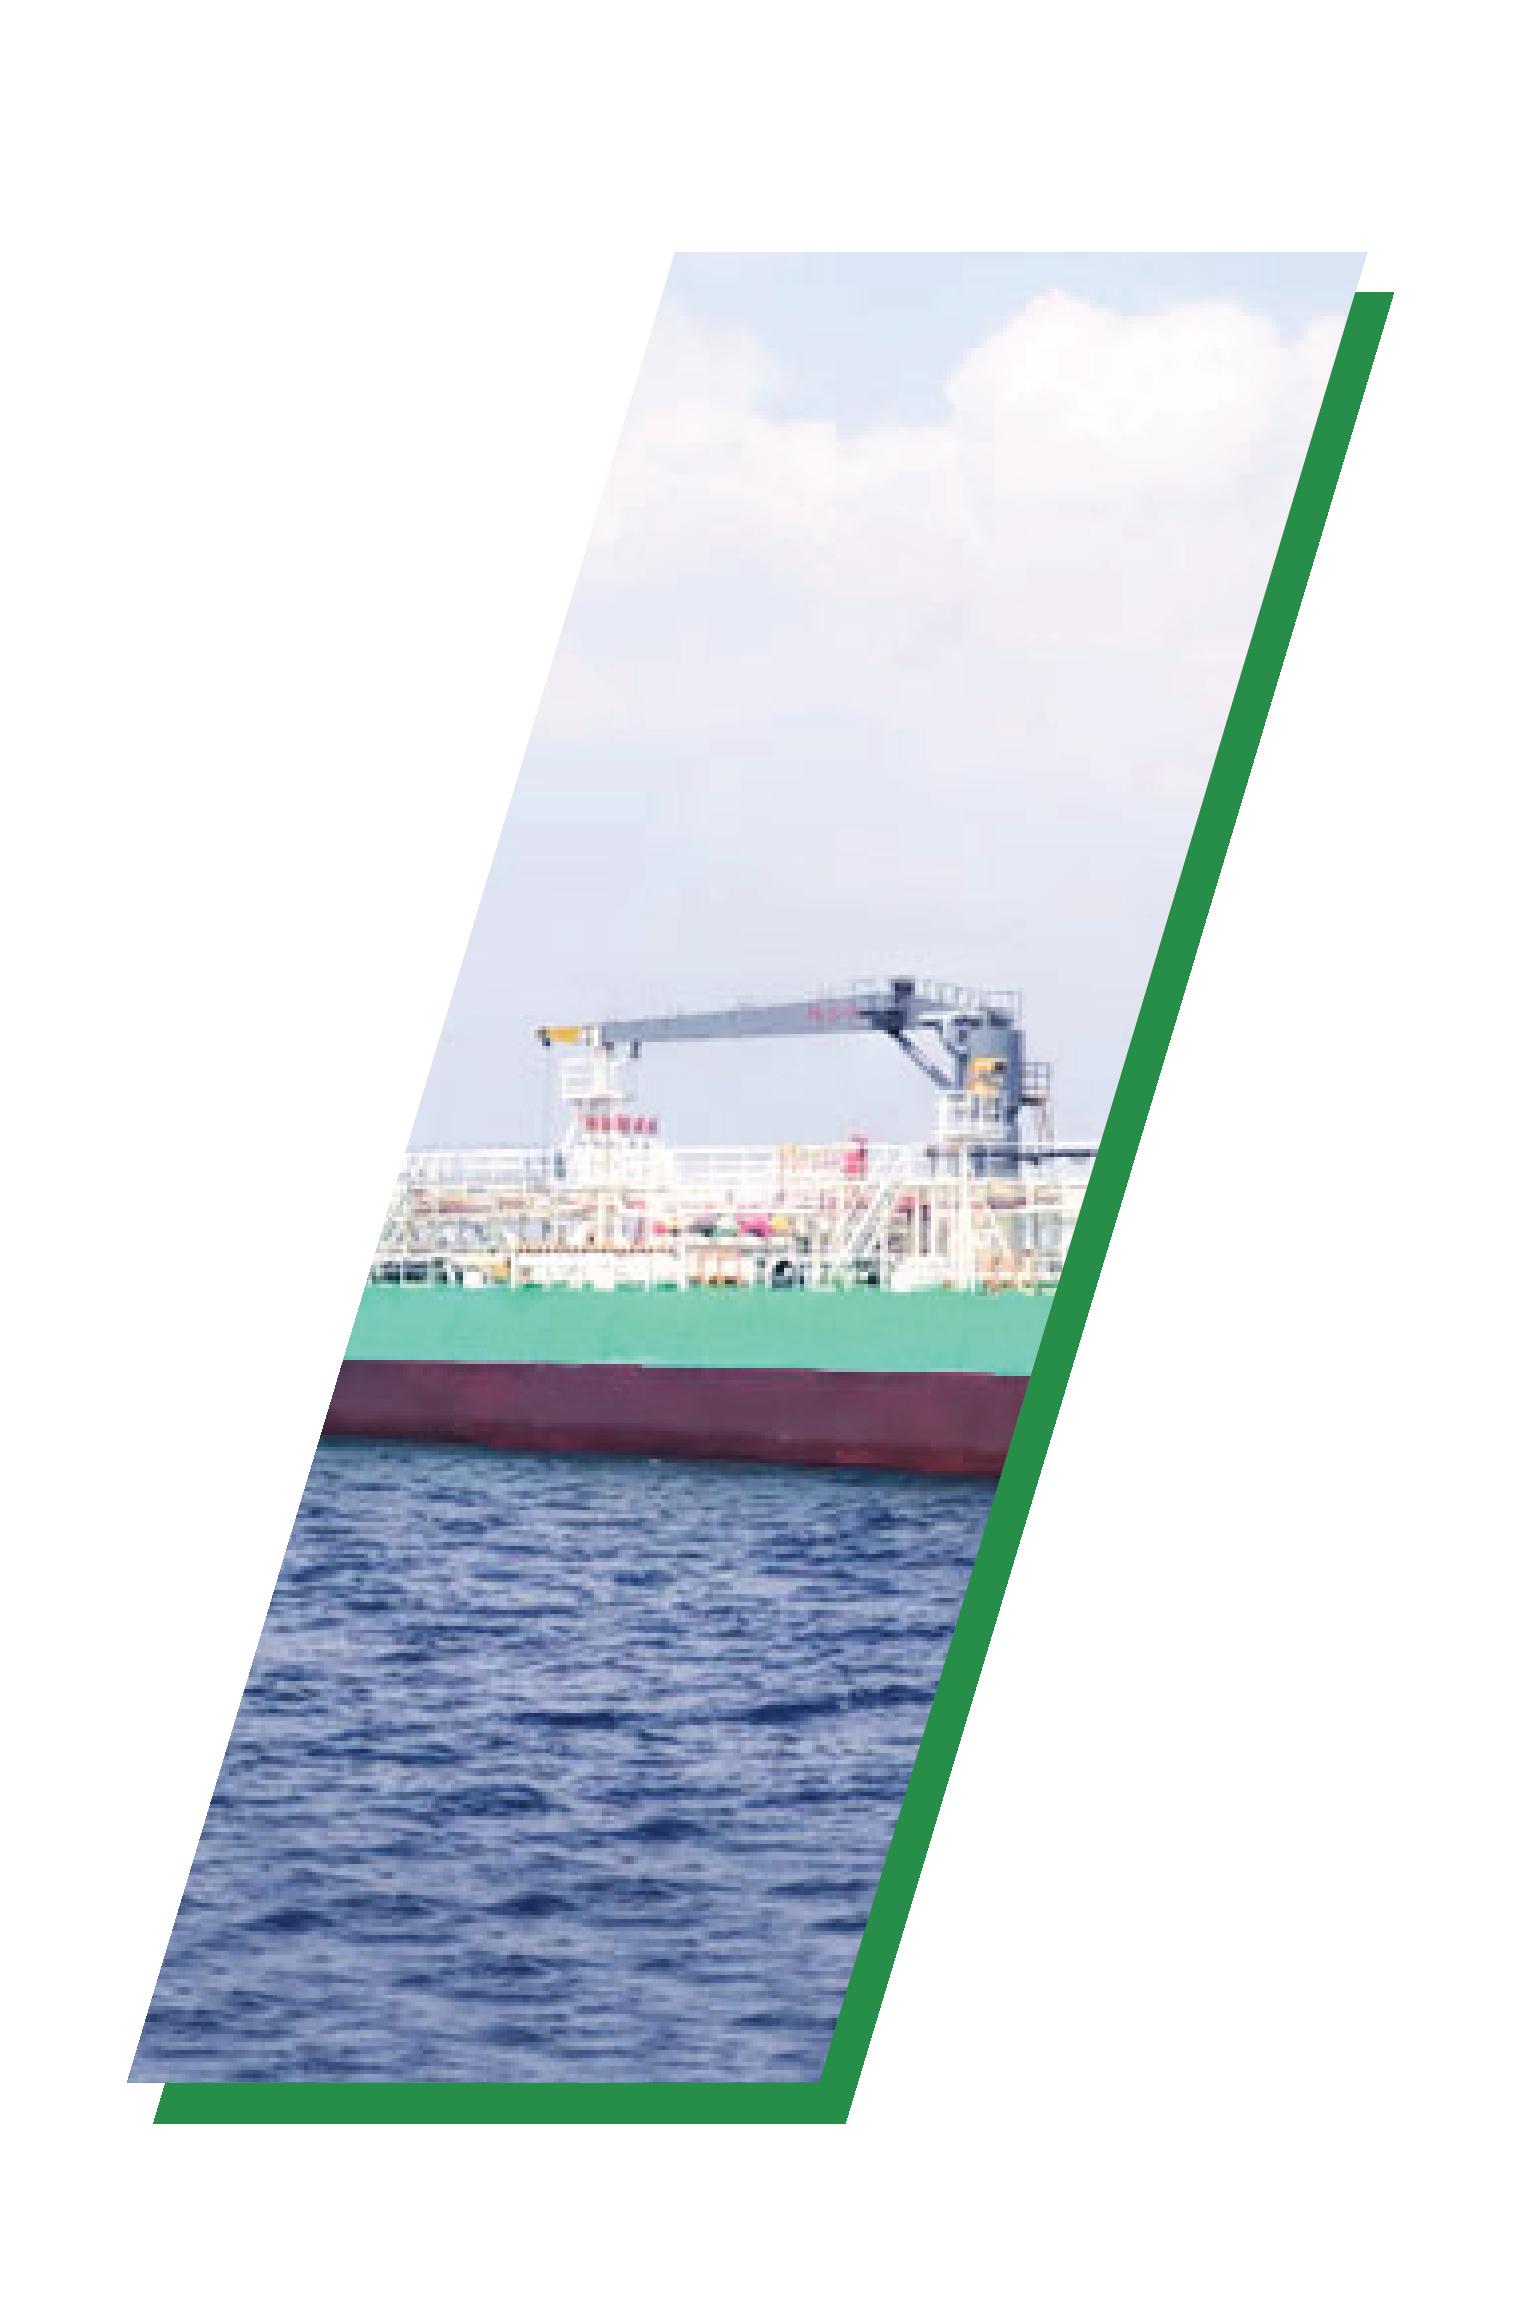 Chelsea Logistics Holdings Corp